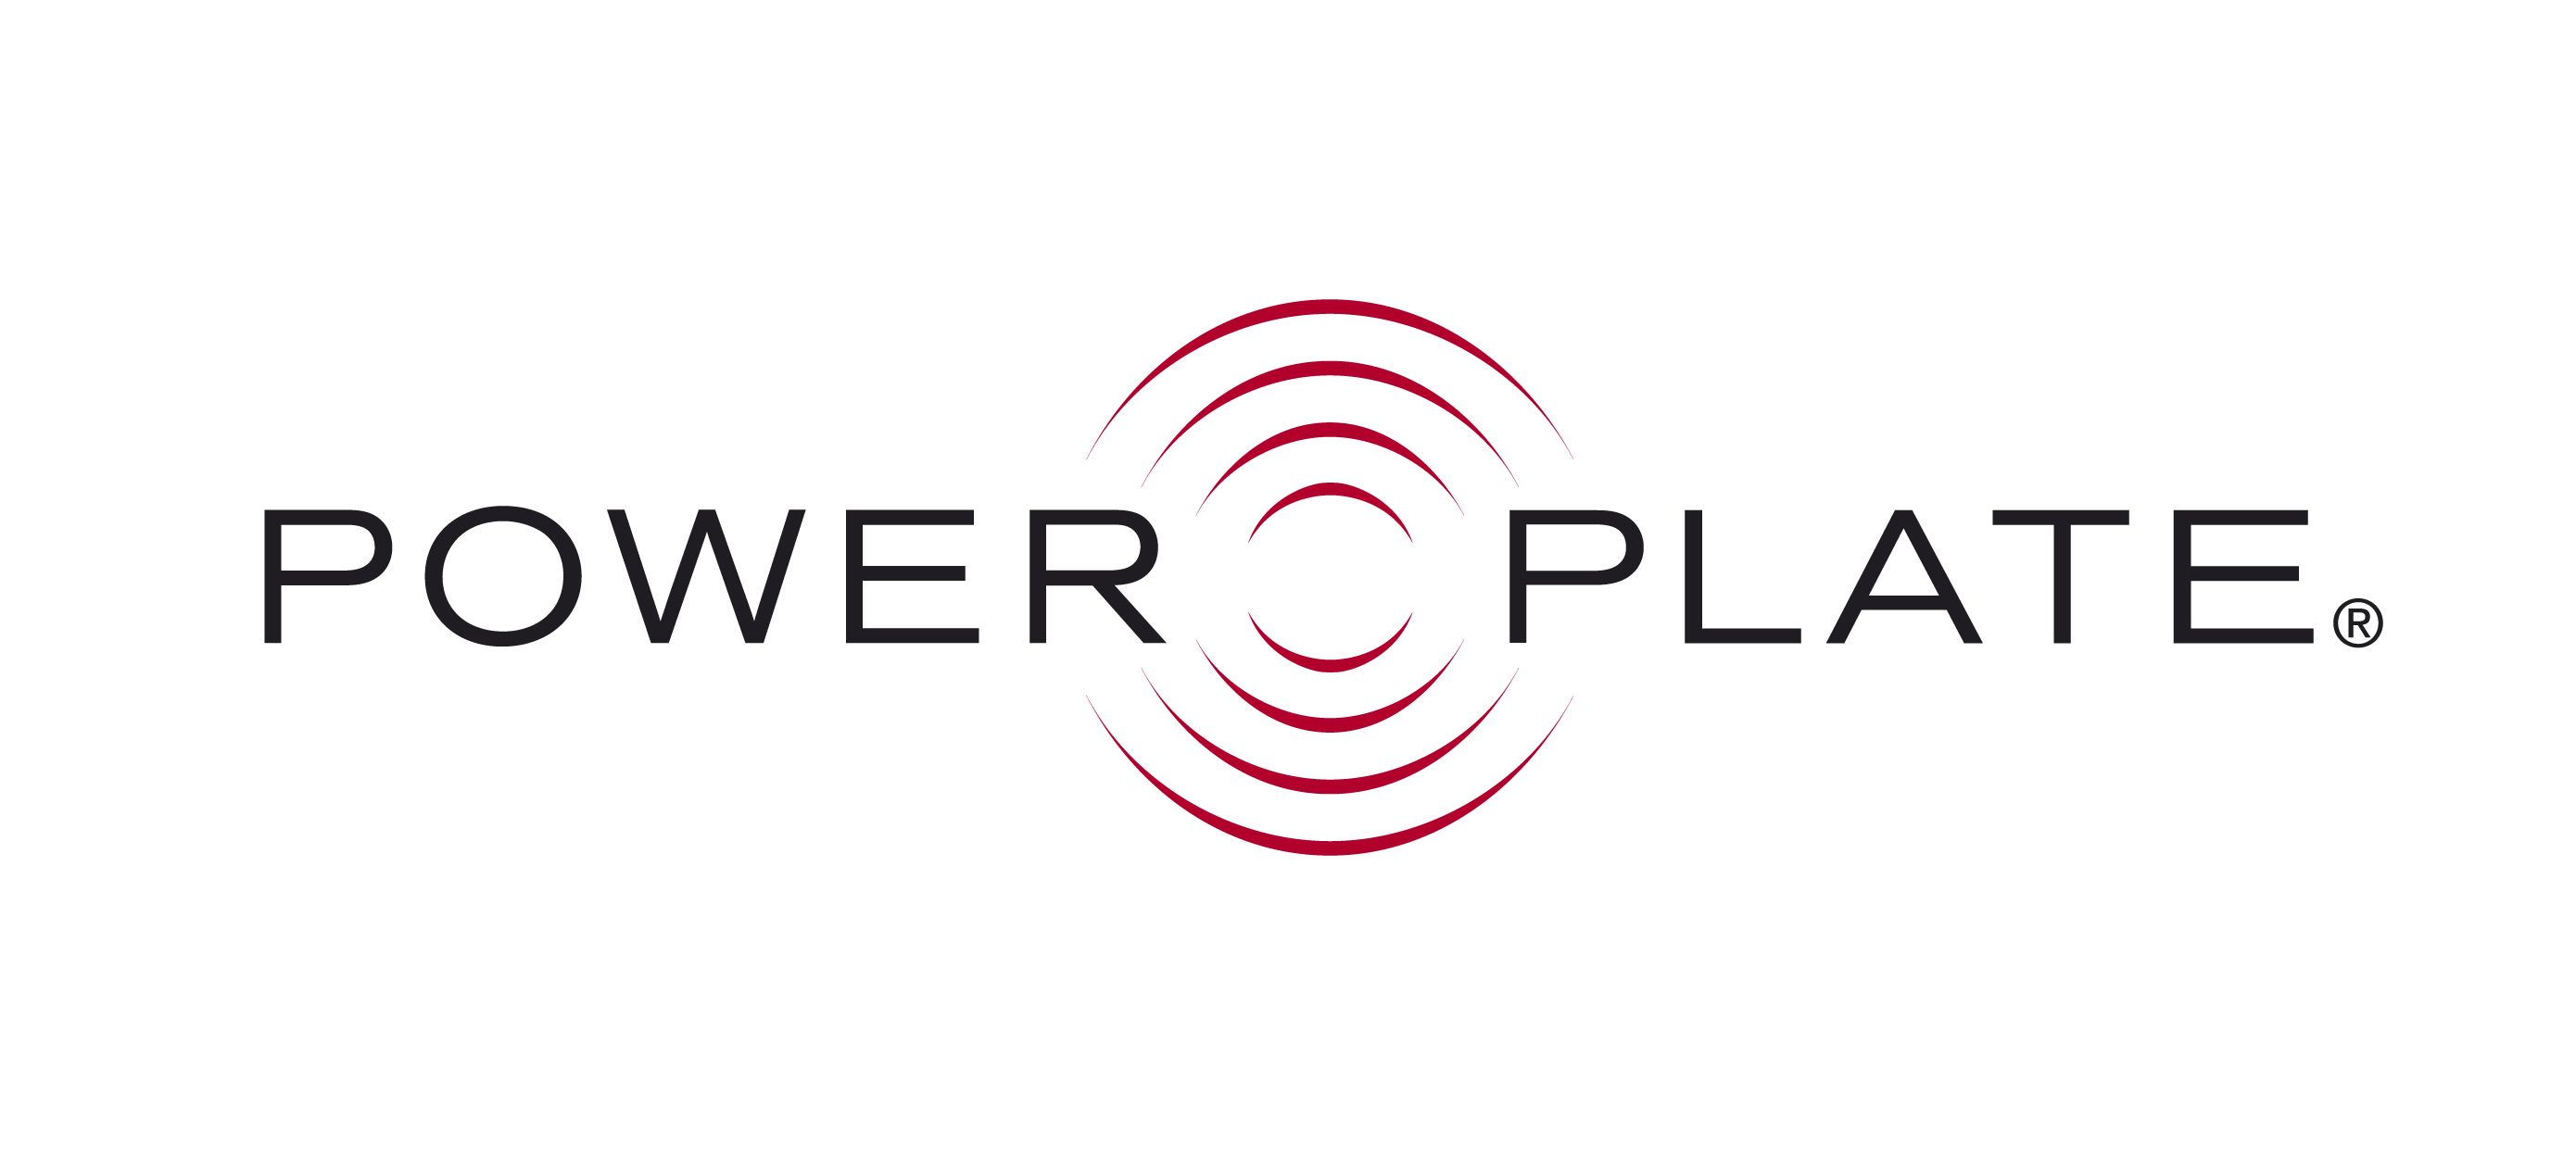 PowerPlate 2010 Logo K 4cRed